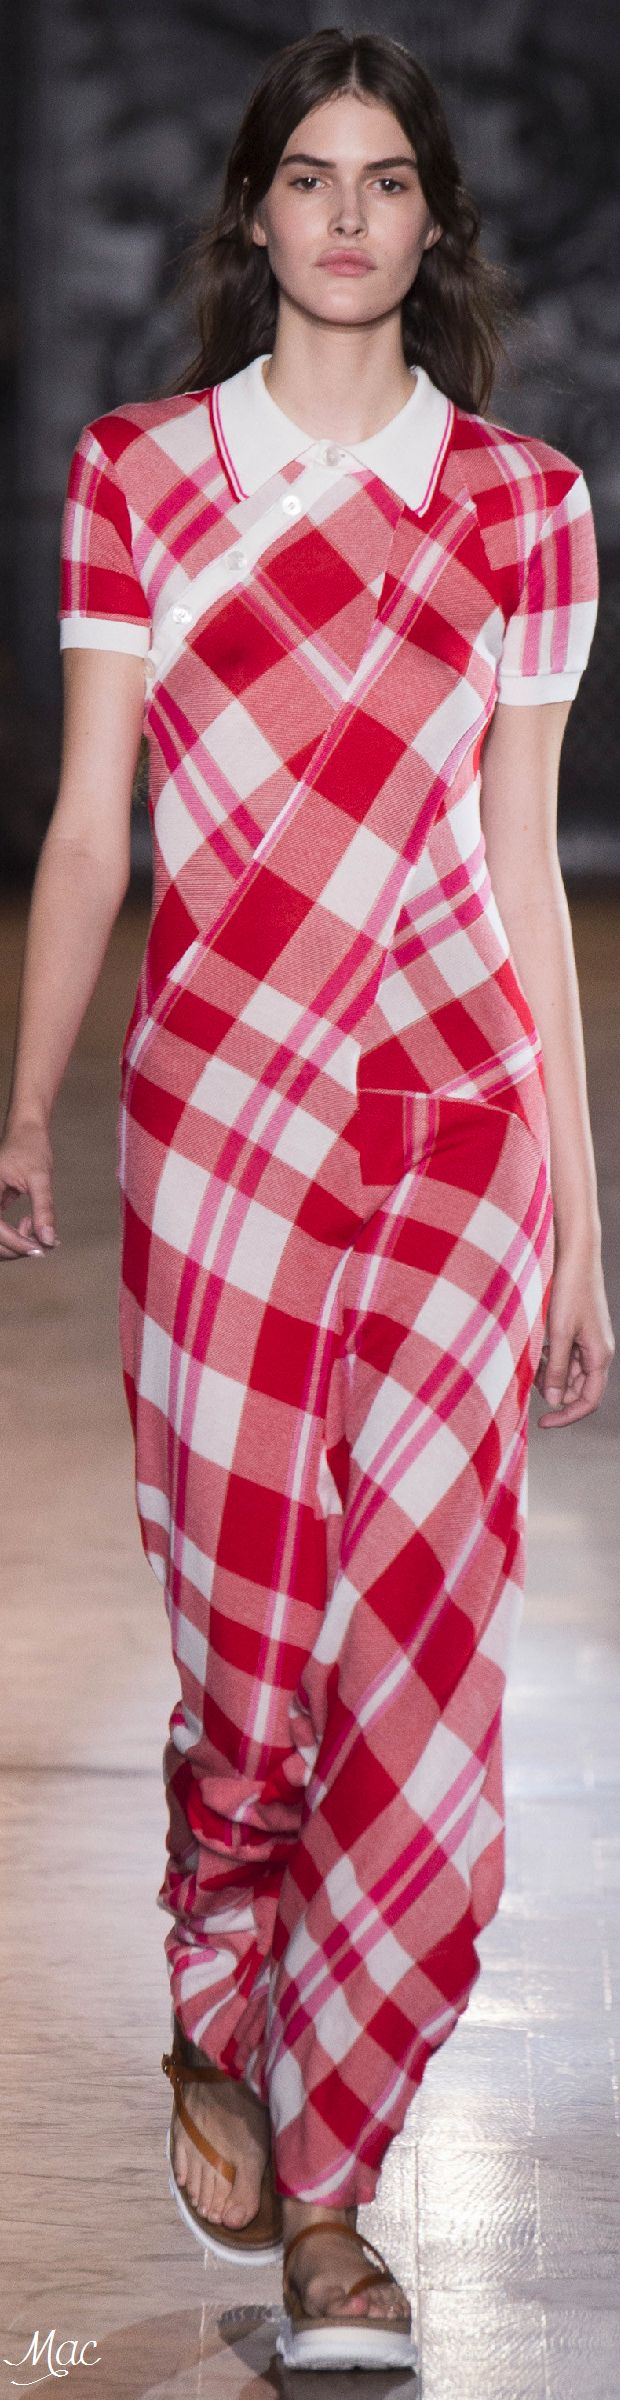 Spring 2016 Ready-to-Wear Stella McCartney